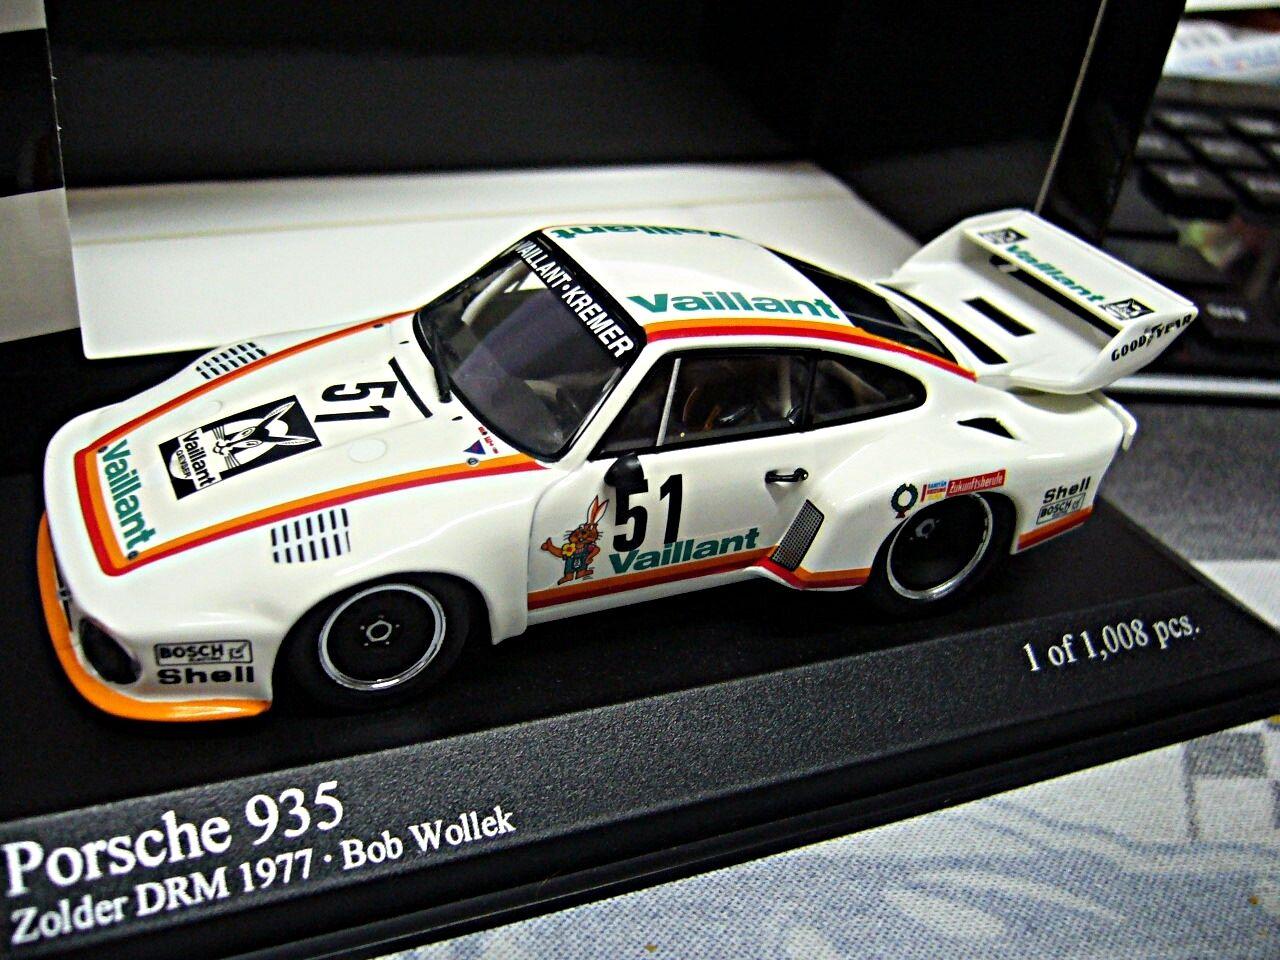 Porsche  935 turbo DRM 1977 Kremer vaillant wollek zolder  51 Minichamps 1 43  Nouvelle liste